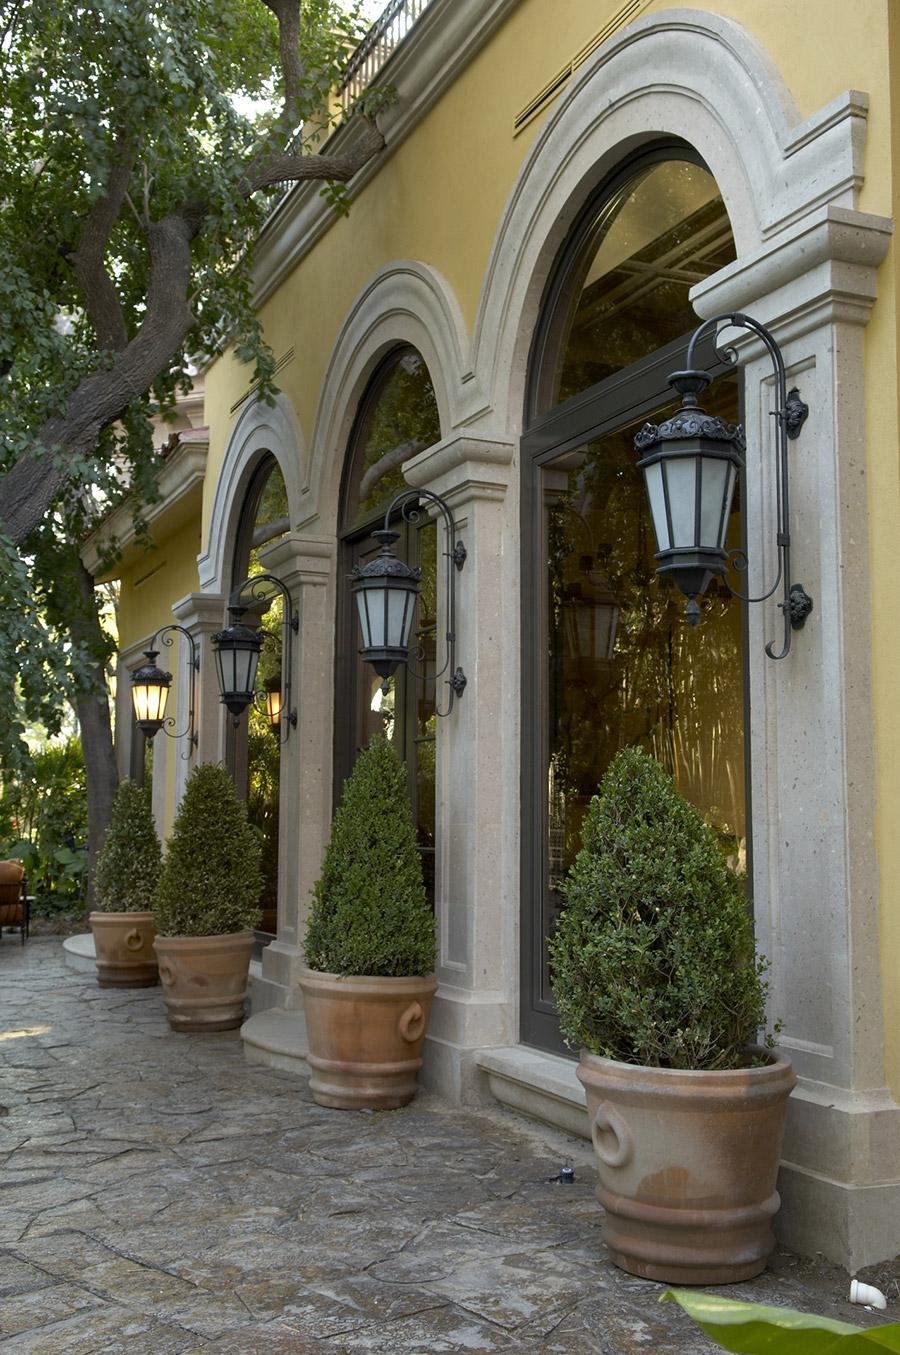 Chianti-OLS-CLA-E-003-classic--outdoor-Steel-Lighting-Post-Santa-Barbara-Residence-(24)